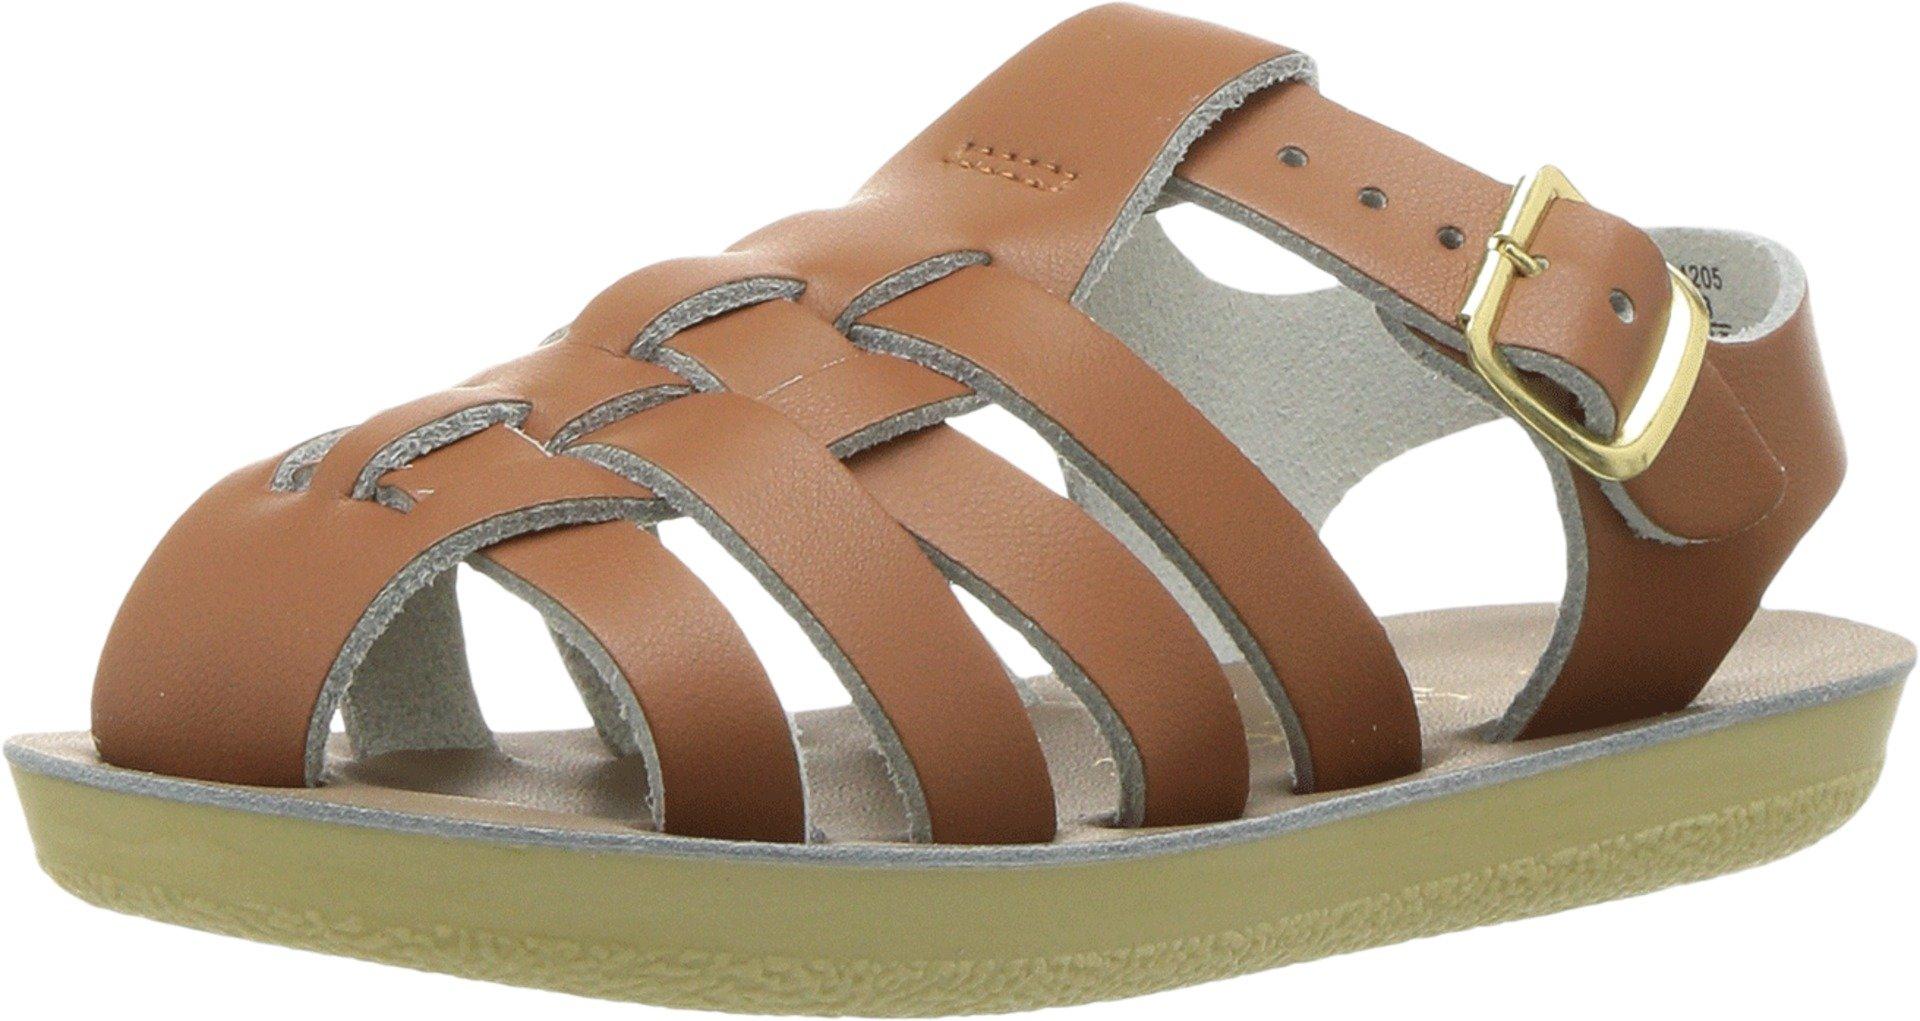 Salt Water Sandals by Hoy Shoes Unisex Sun-San - Sailors (Toddler/Little Kid) Tan 6 M US Toddler